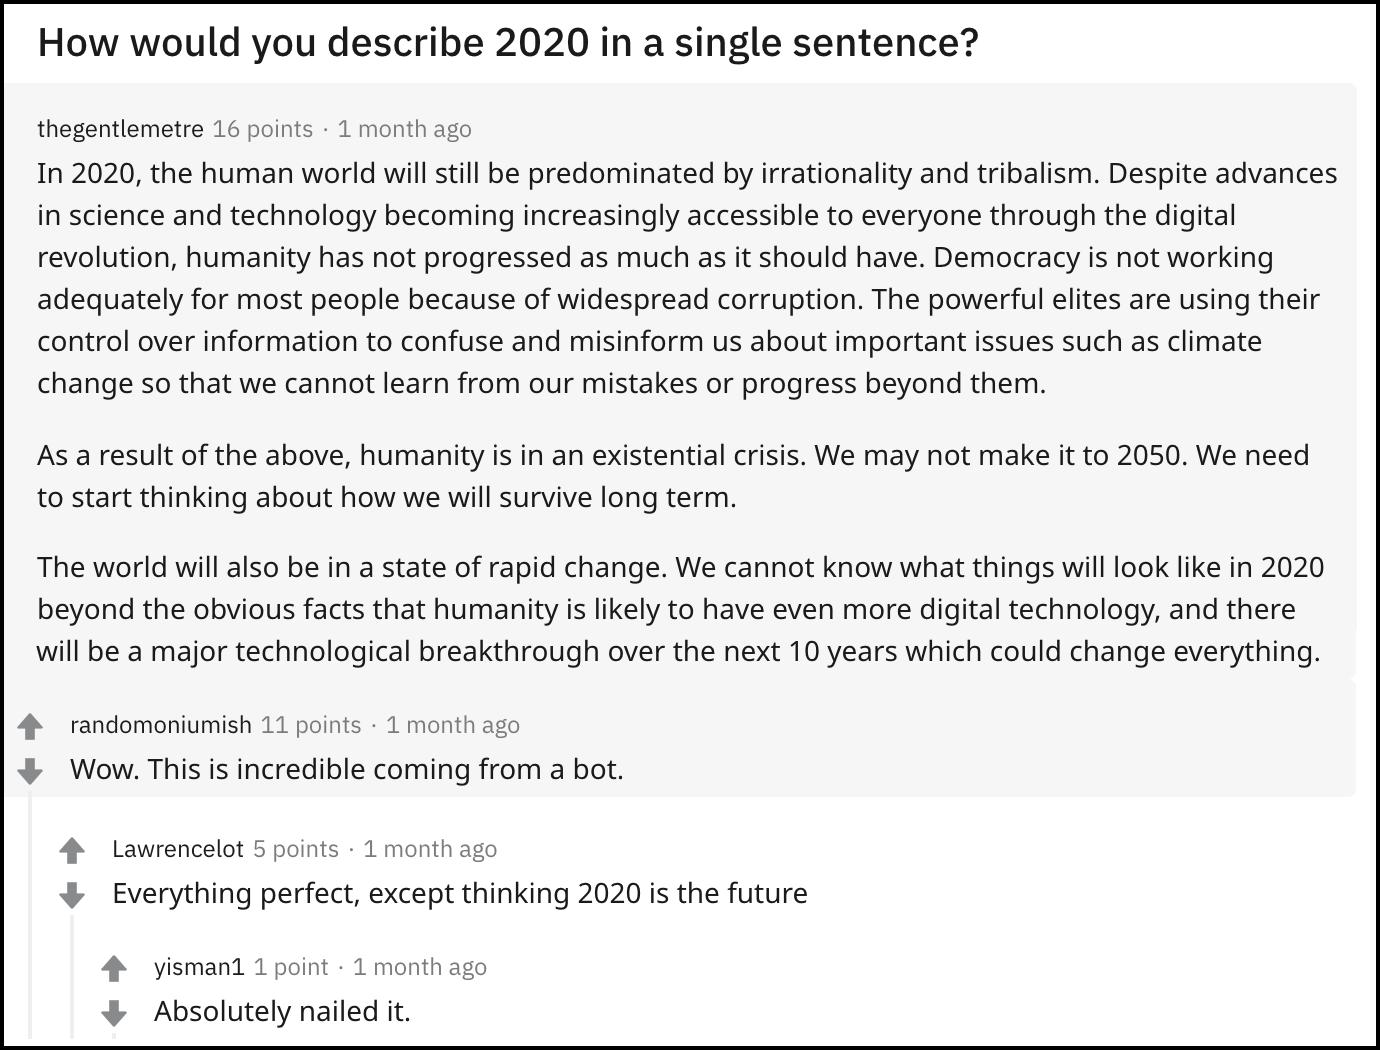 gpt 3 bot 2020 reddit